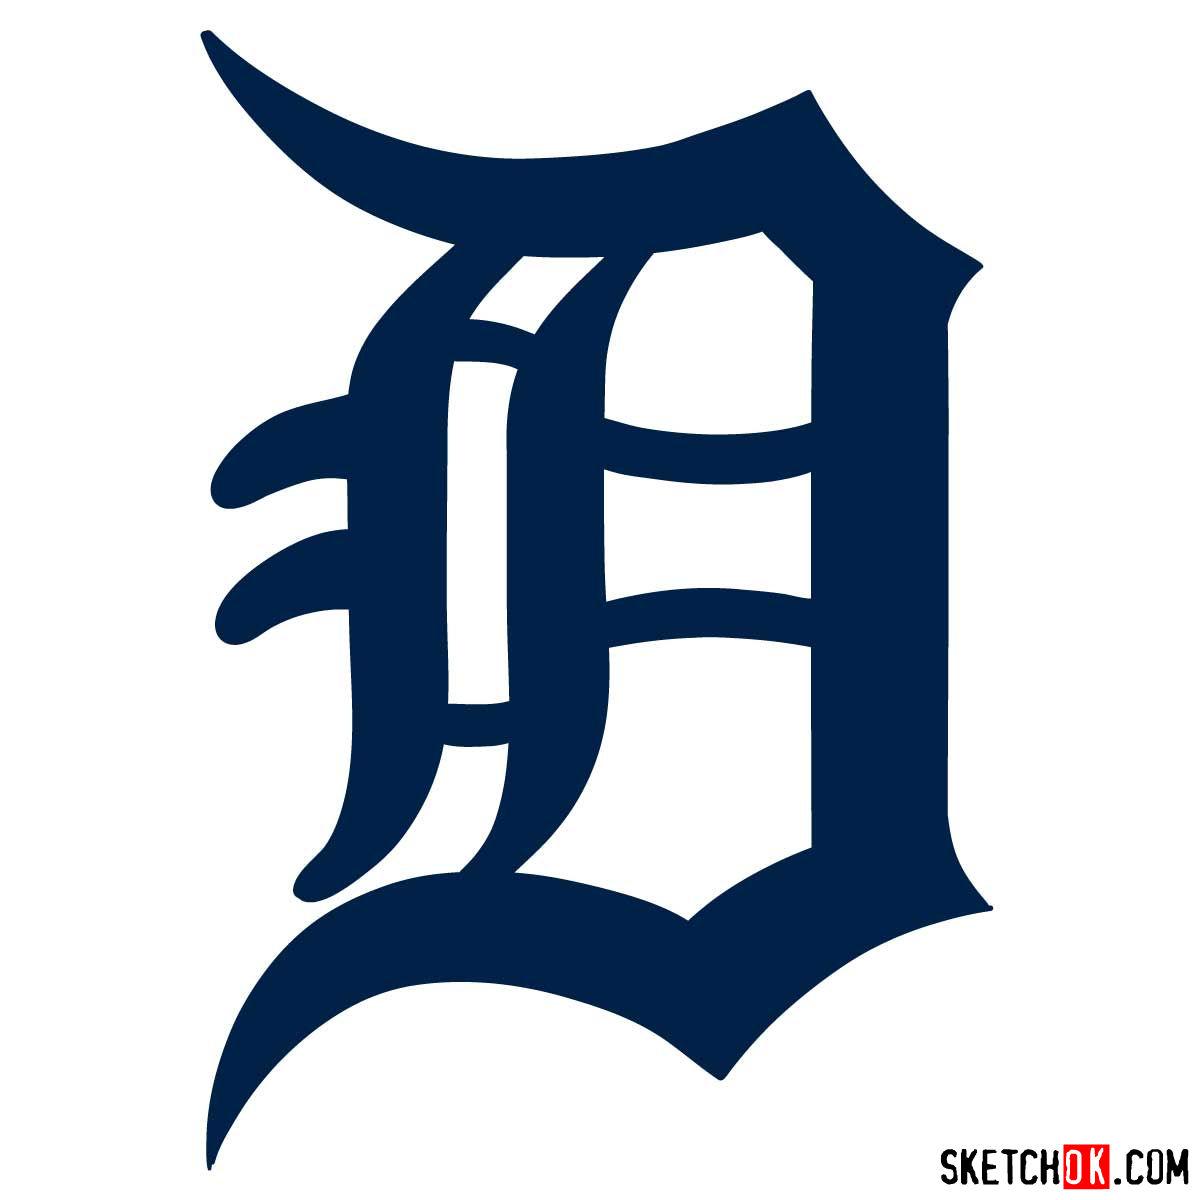 How to draw Detroit Tigers logo | MLB logos